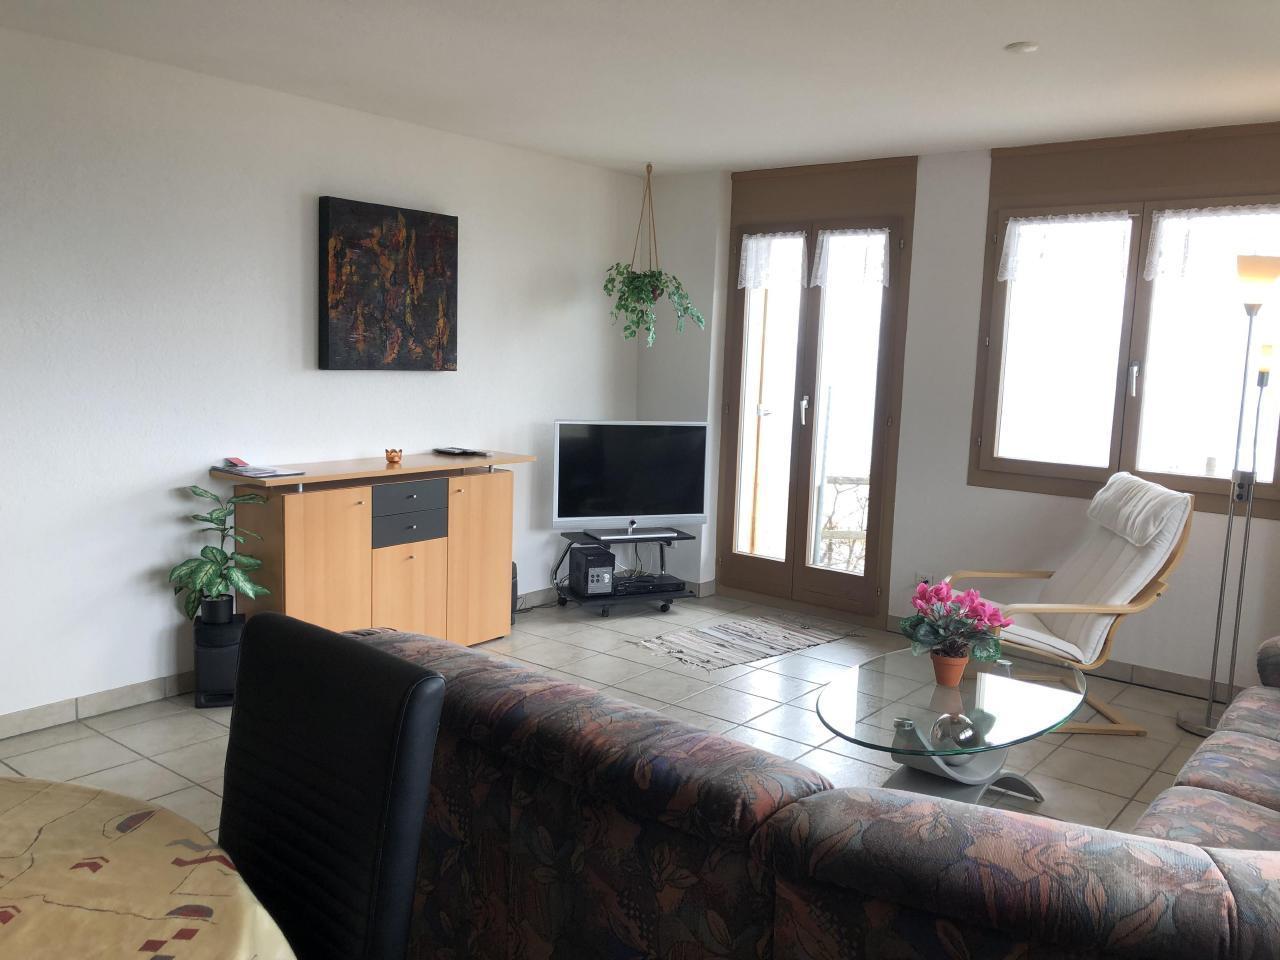 Appartement de vacances Chalet Wieseli 4-Bettwohnung (2692215), Hasliberg Wasserwendi, Meiringen - Hasliberg, Oberland bernois, Suisse, image 7